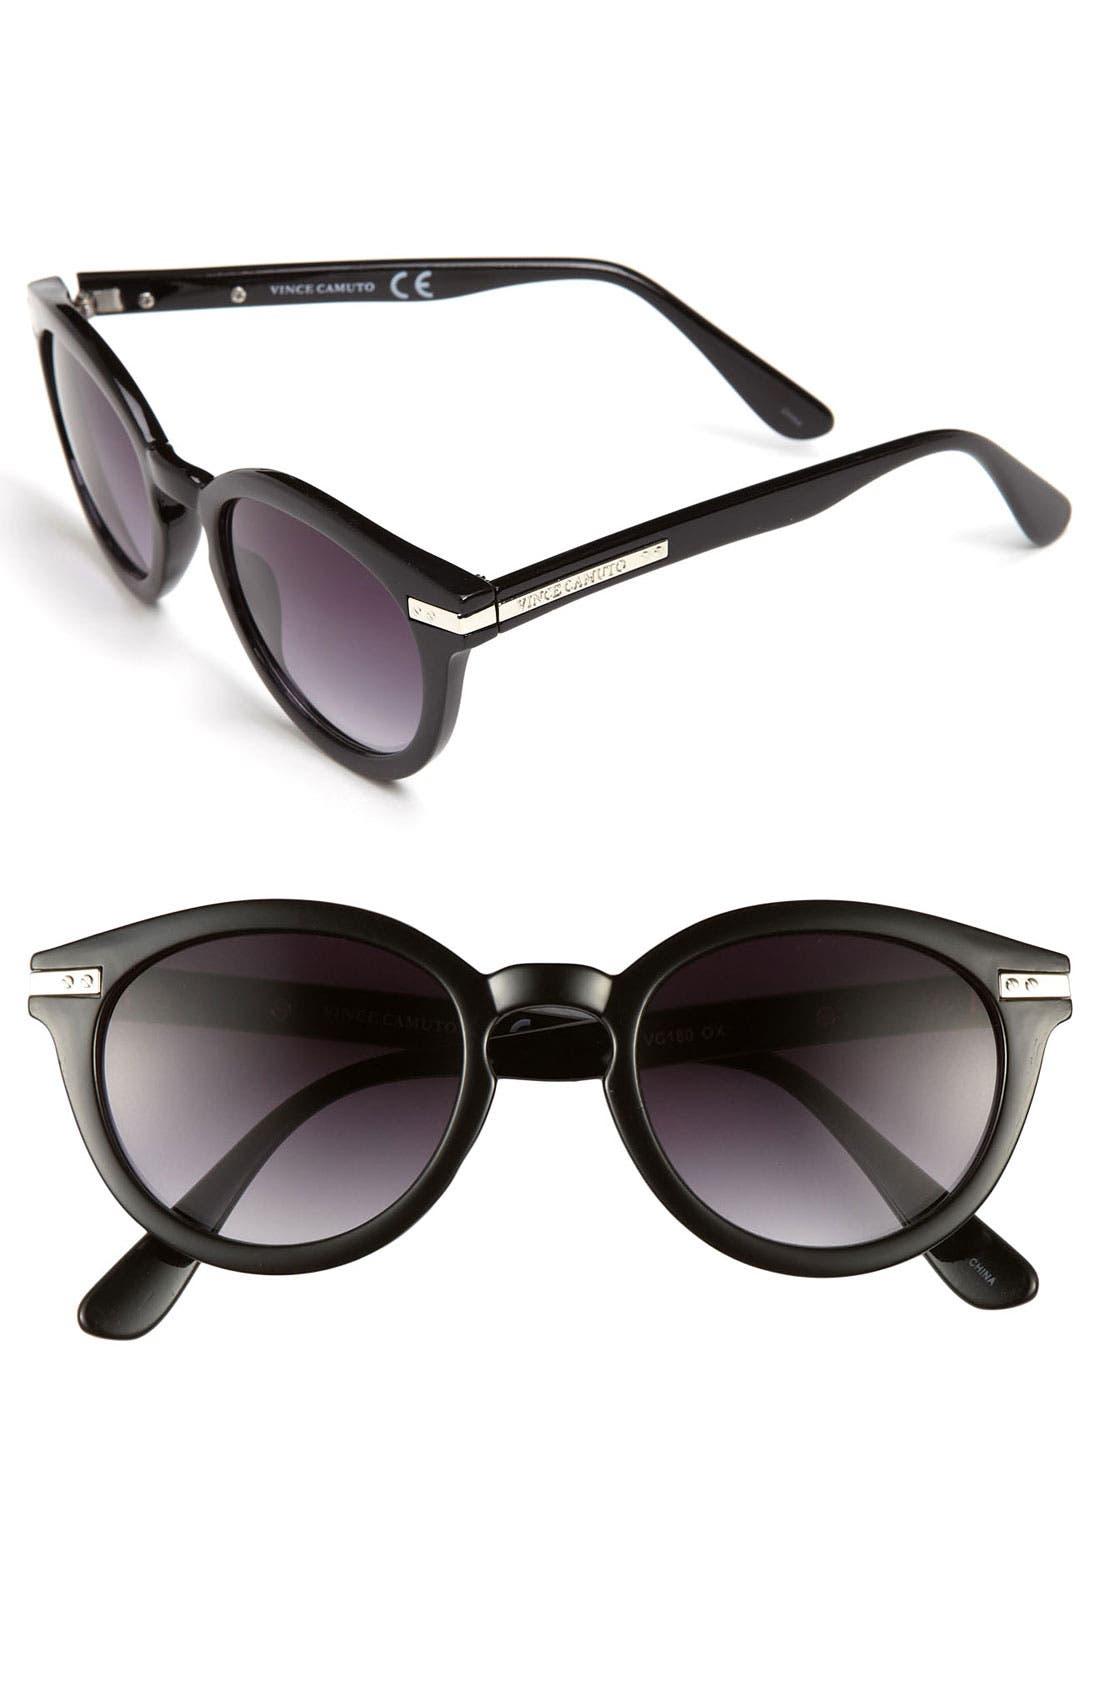 Main Image - Vince Camuto 50mm Vintage Round Sunglasses